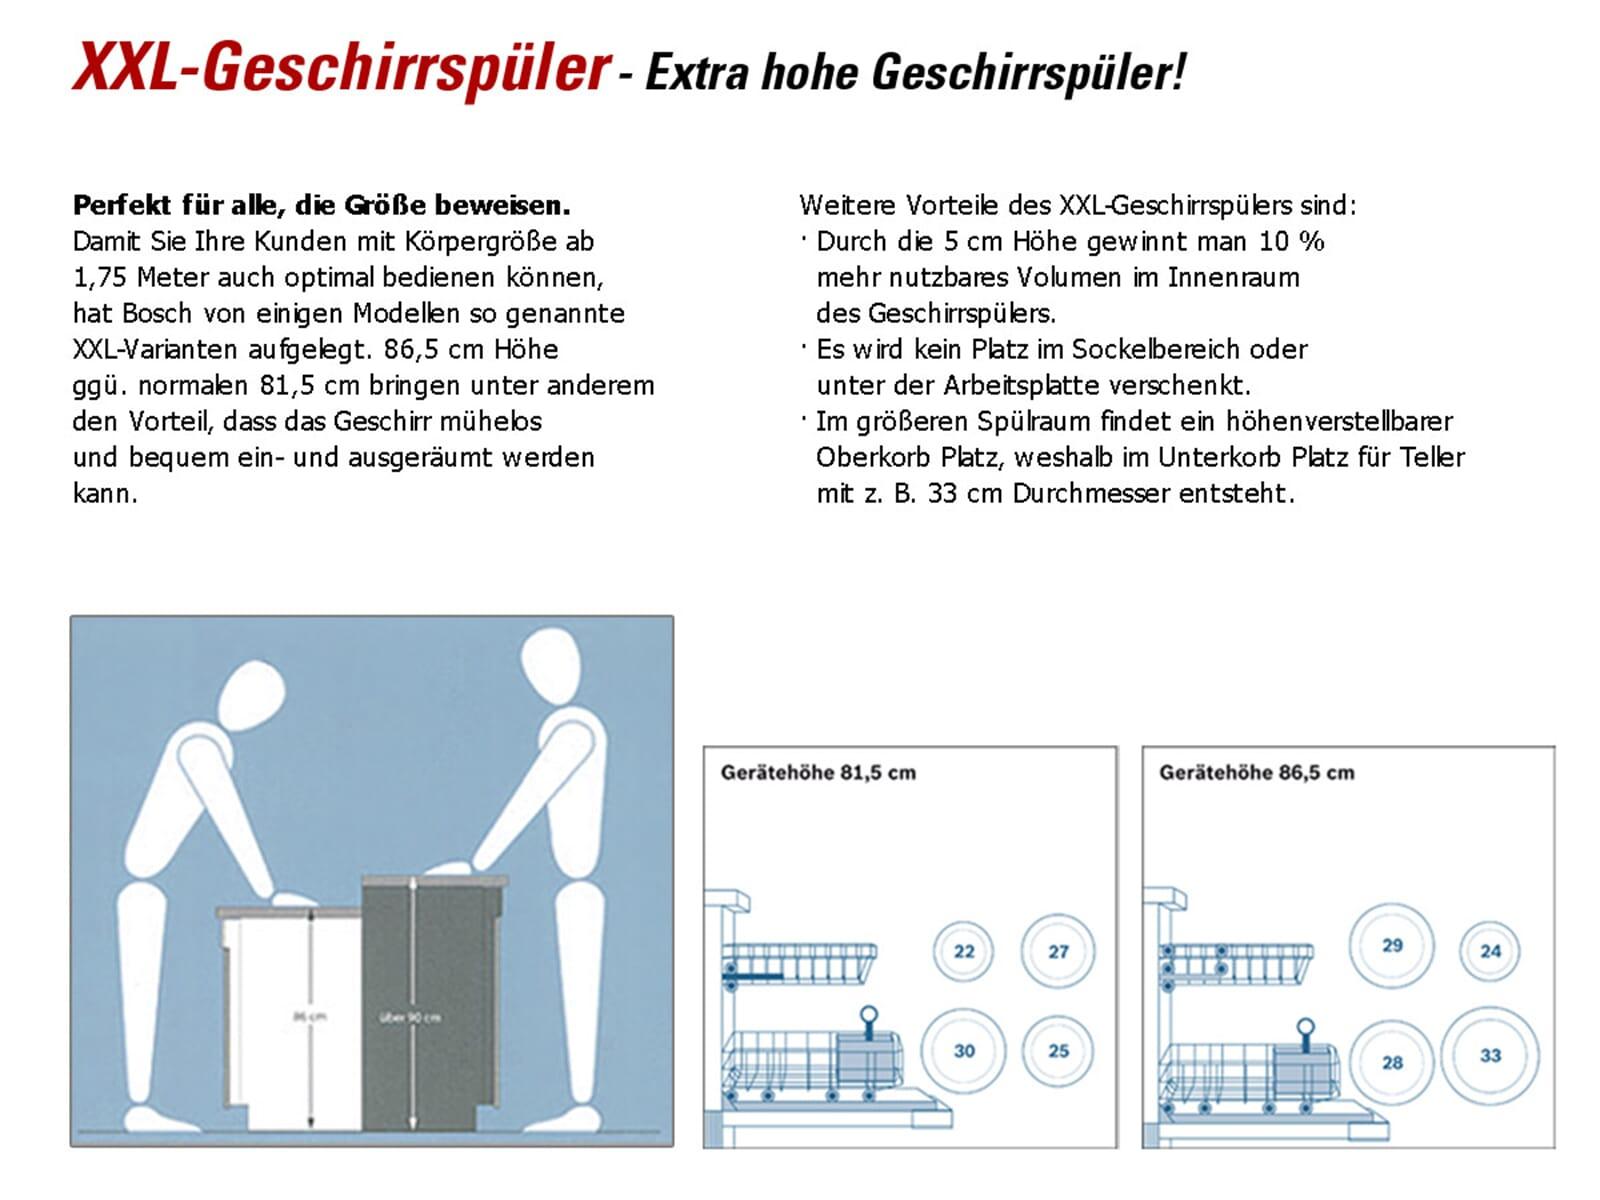 bosch sbv40d80eu vollintegriert einbau gro raumsp ler geschirrsp lmaschine ebay. Black Bedroom Furniture Sets. Home Design Ideas